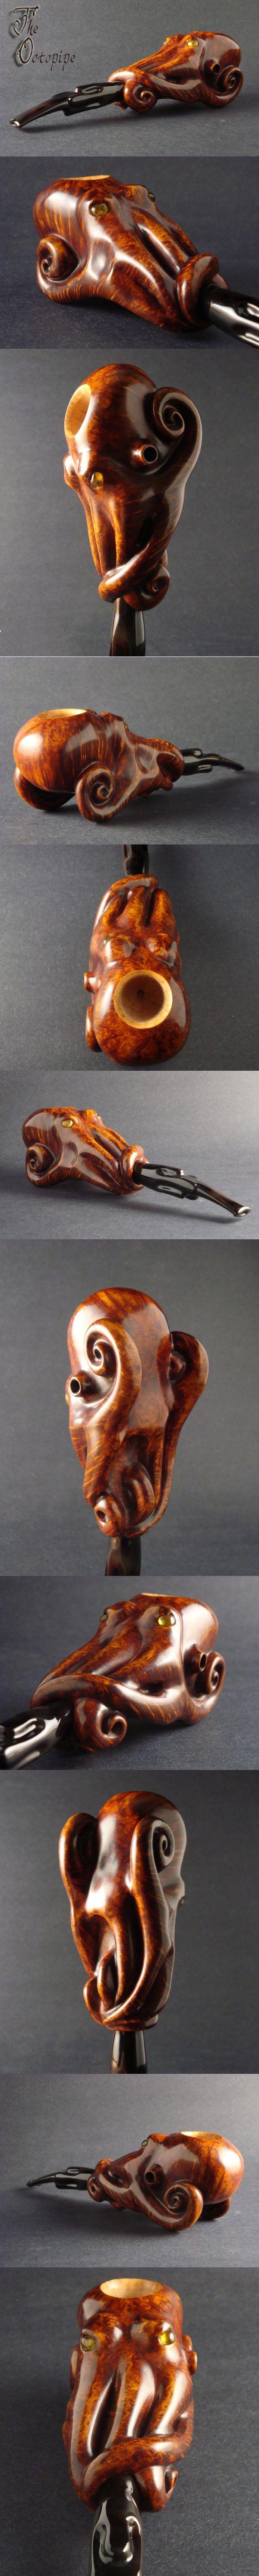 The Octopipe- A Little smoke of cthulhu